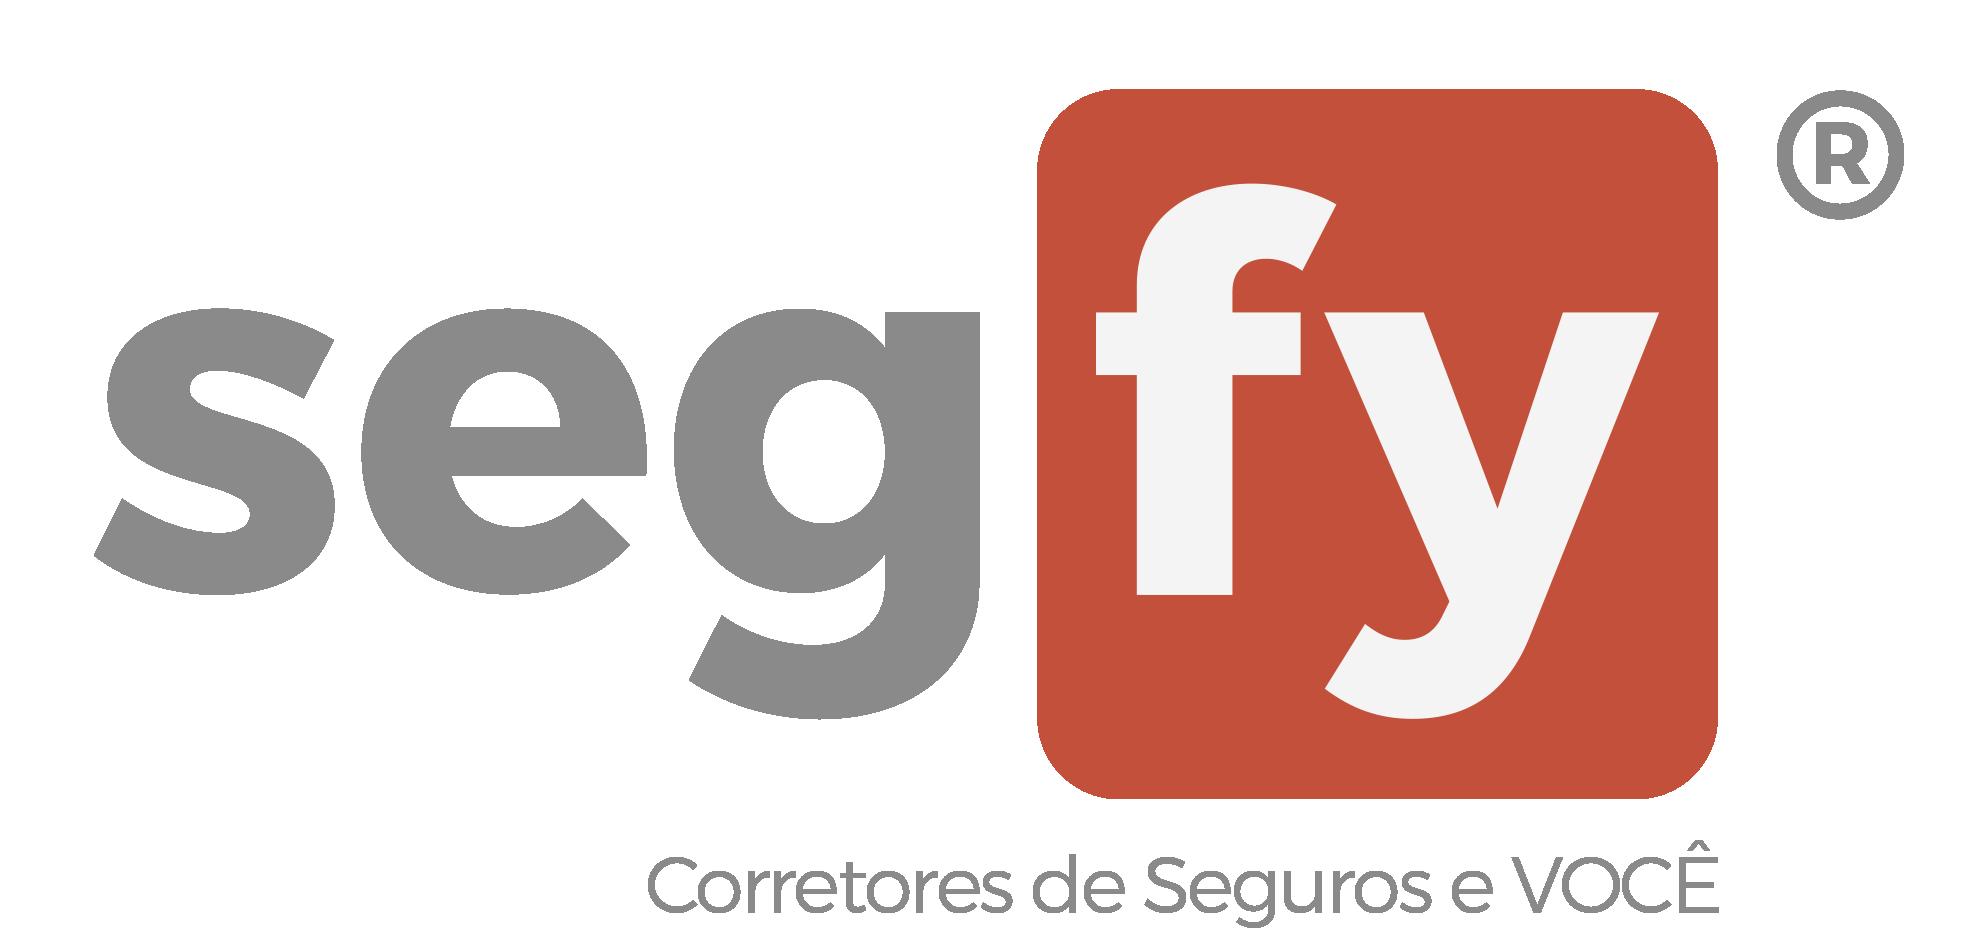 Segfy